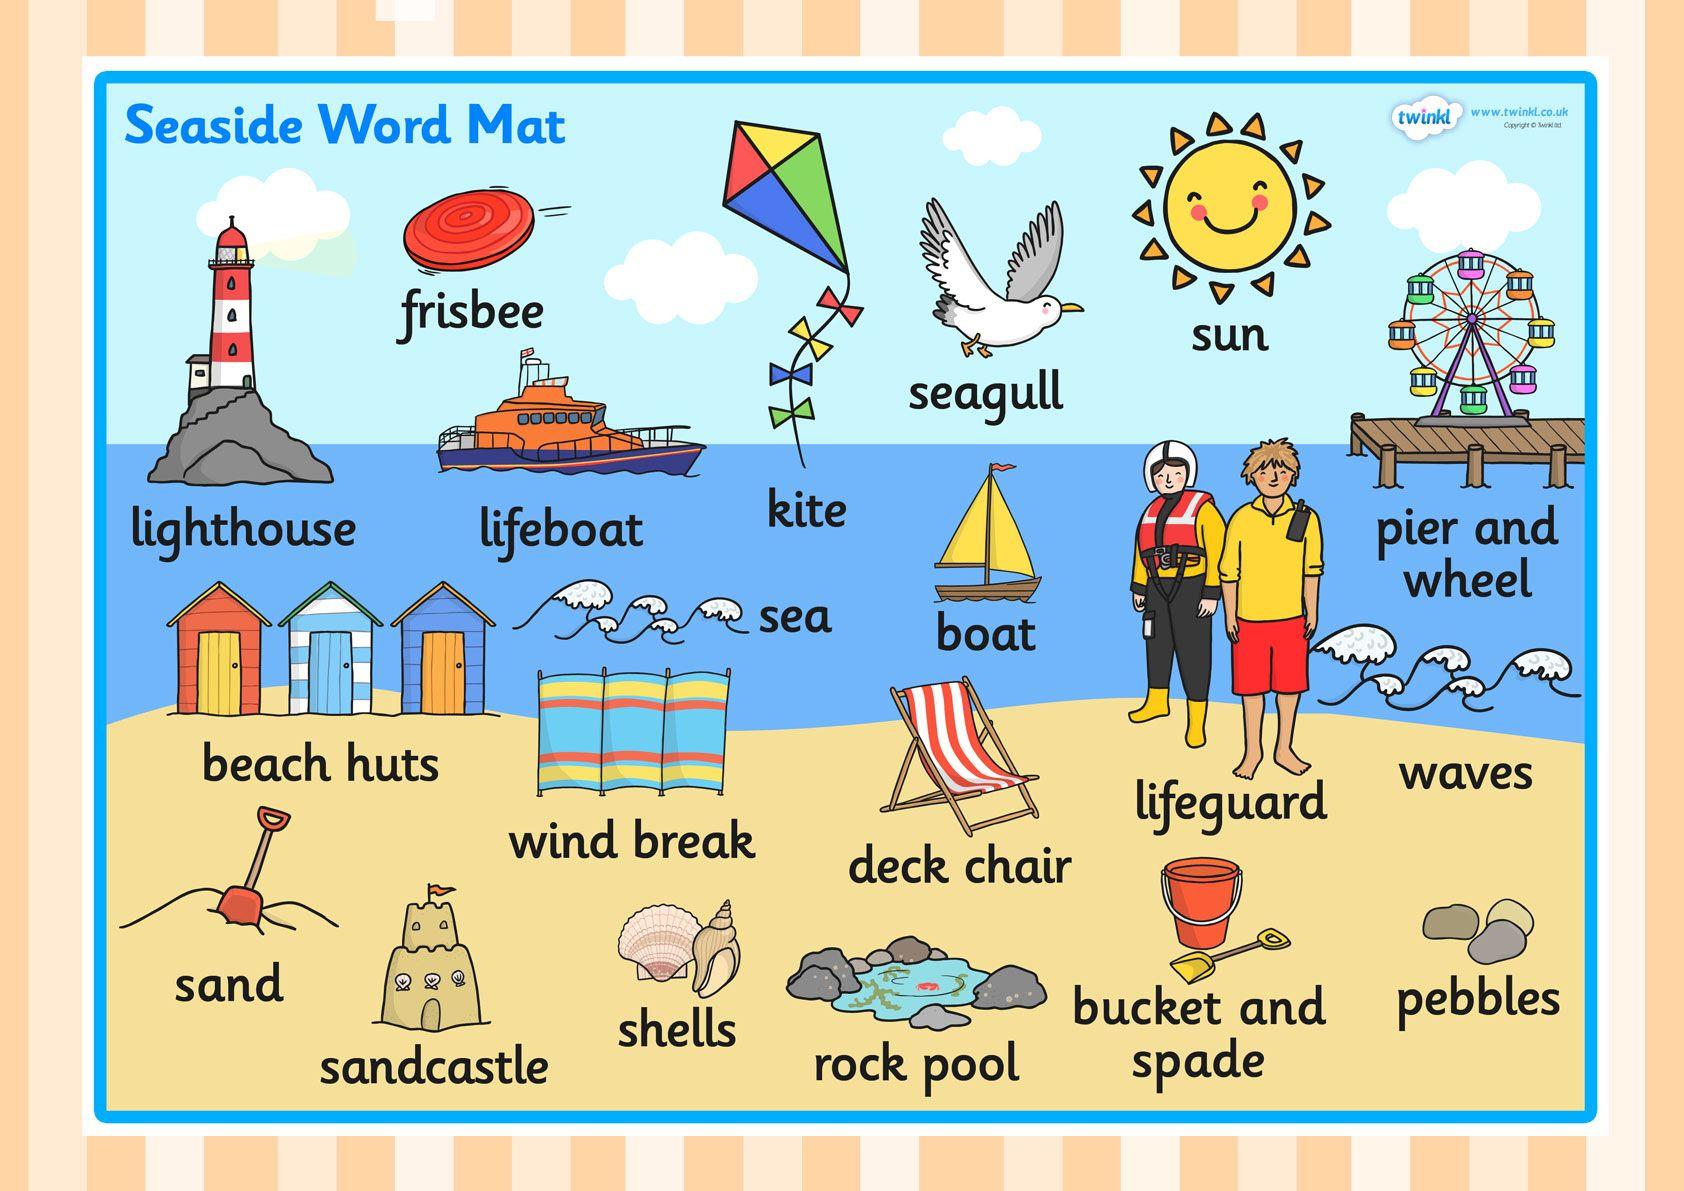 The Seaside Word Mat